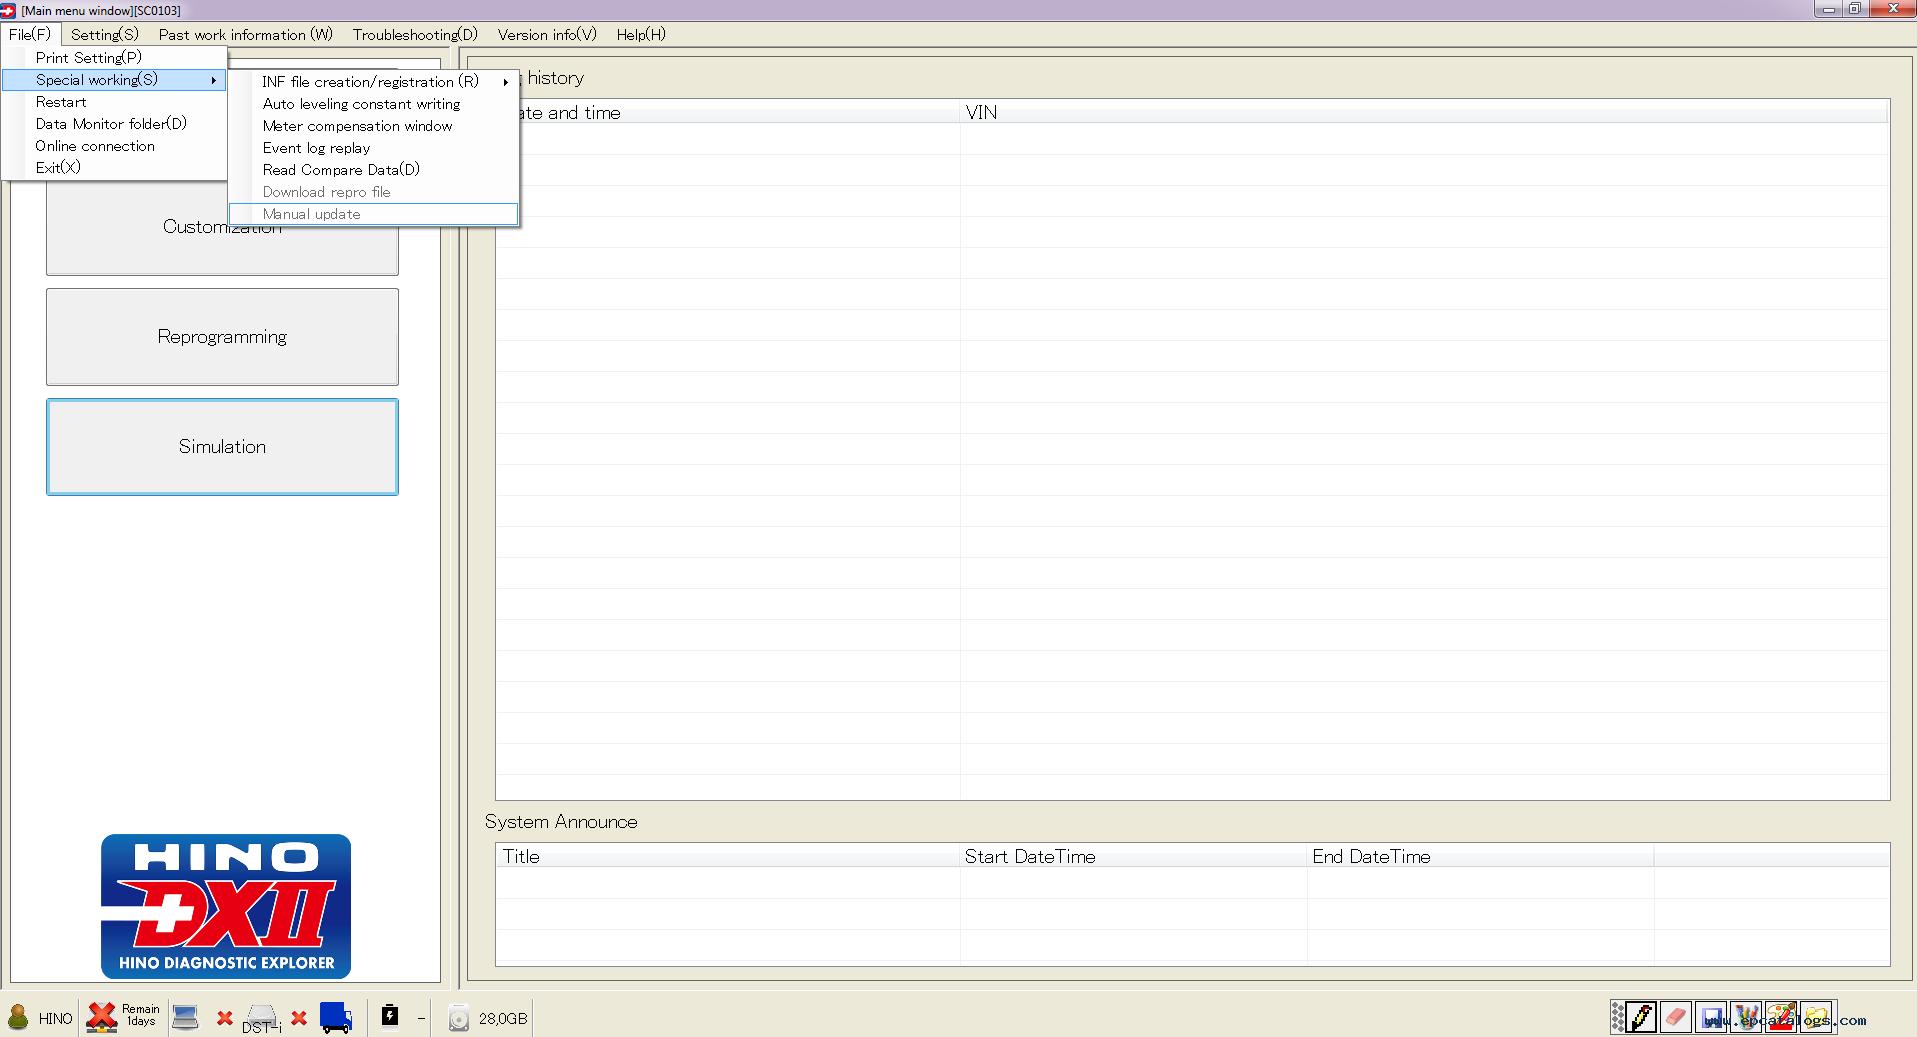 Hino Diagnostic eXplorer II - Hino DX2 1 1 19 9 + Database v2 1 19